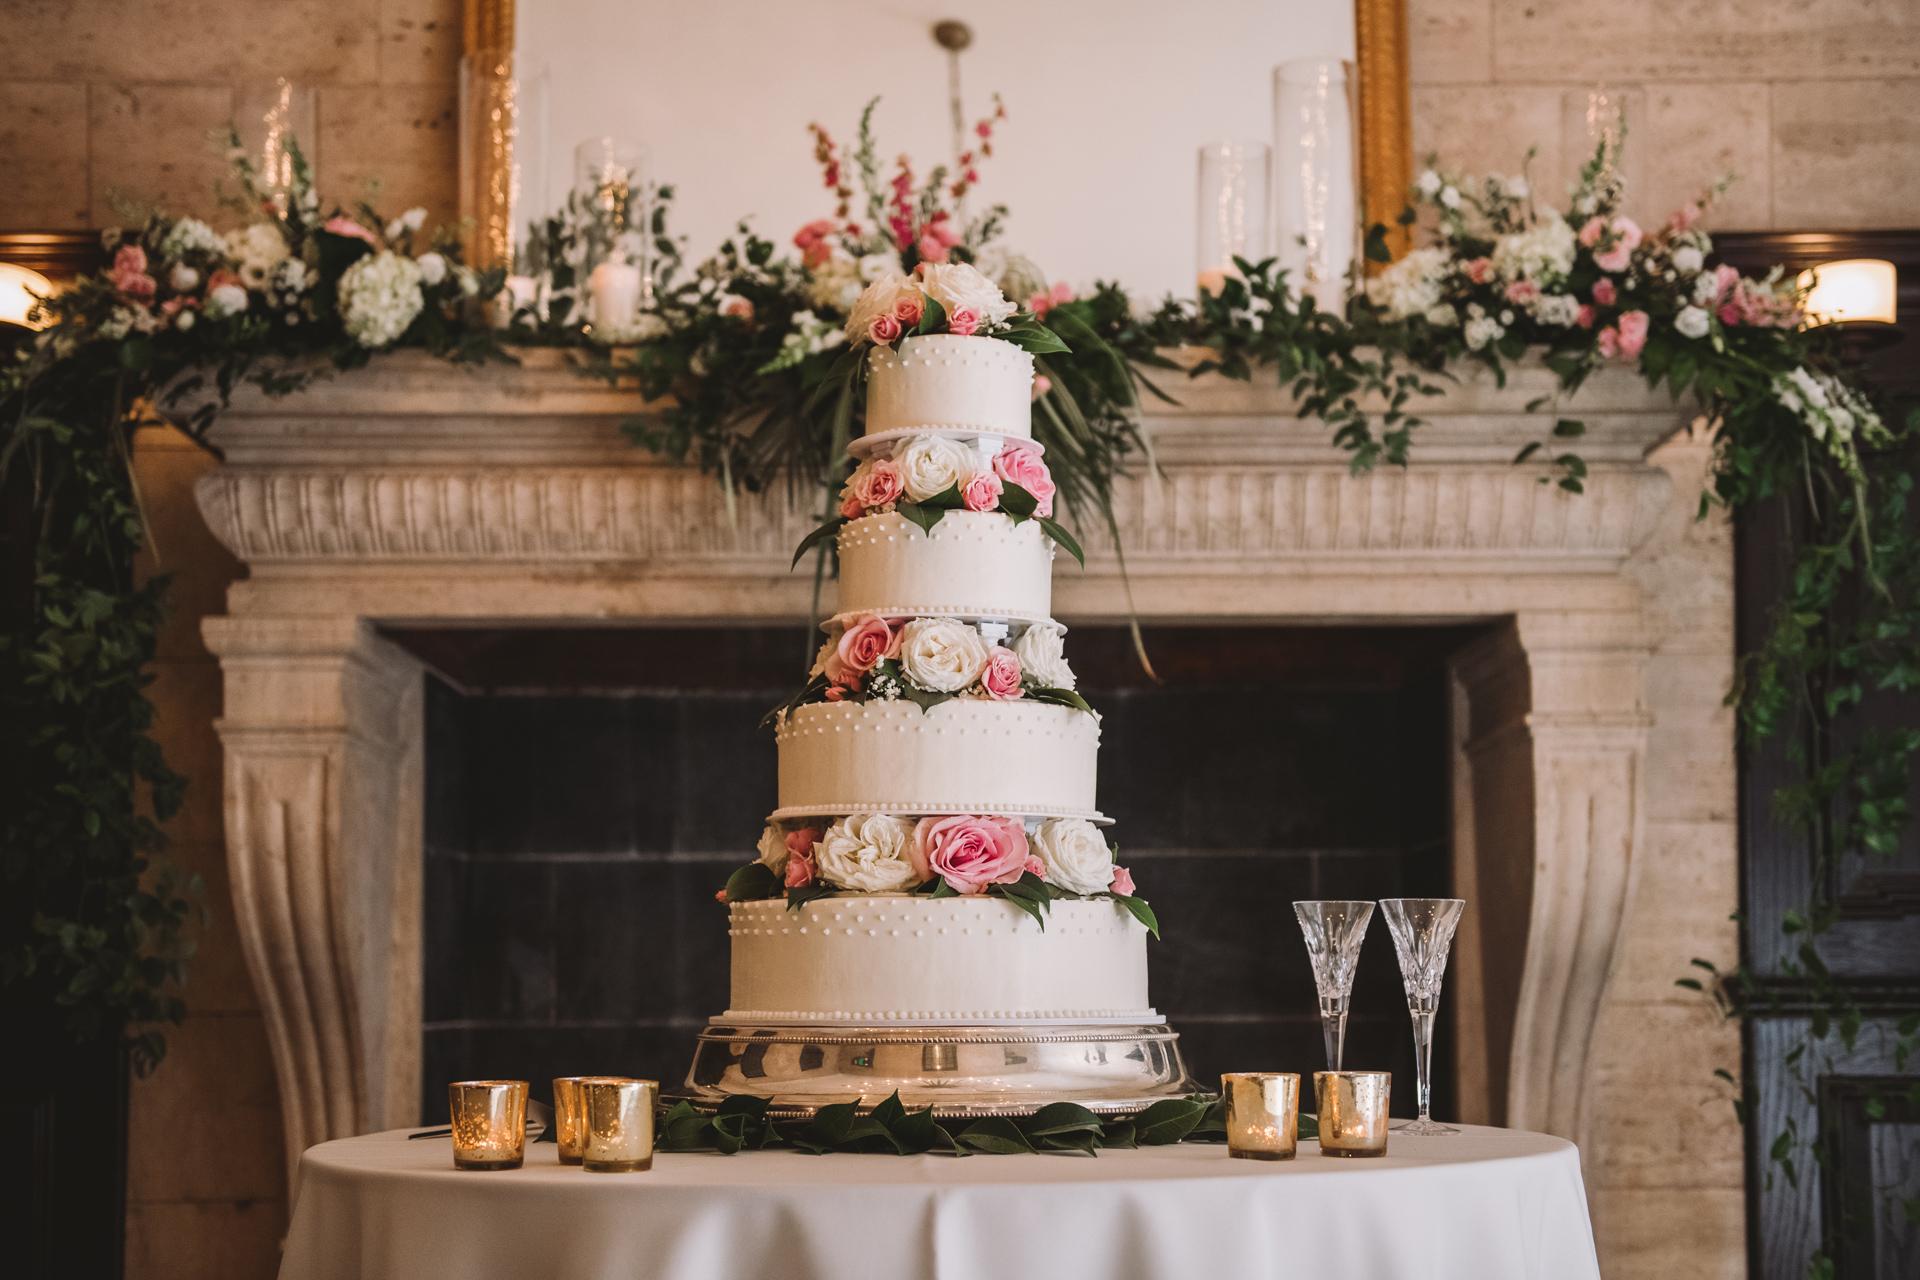 wedding cake in the library 1208 washington